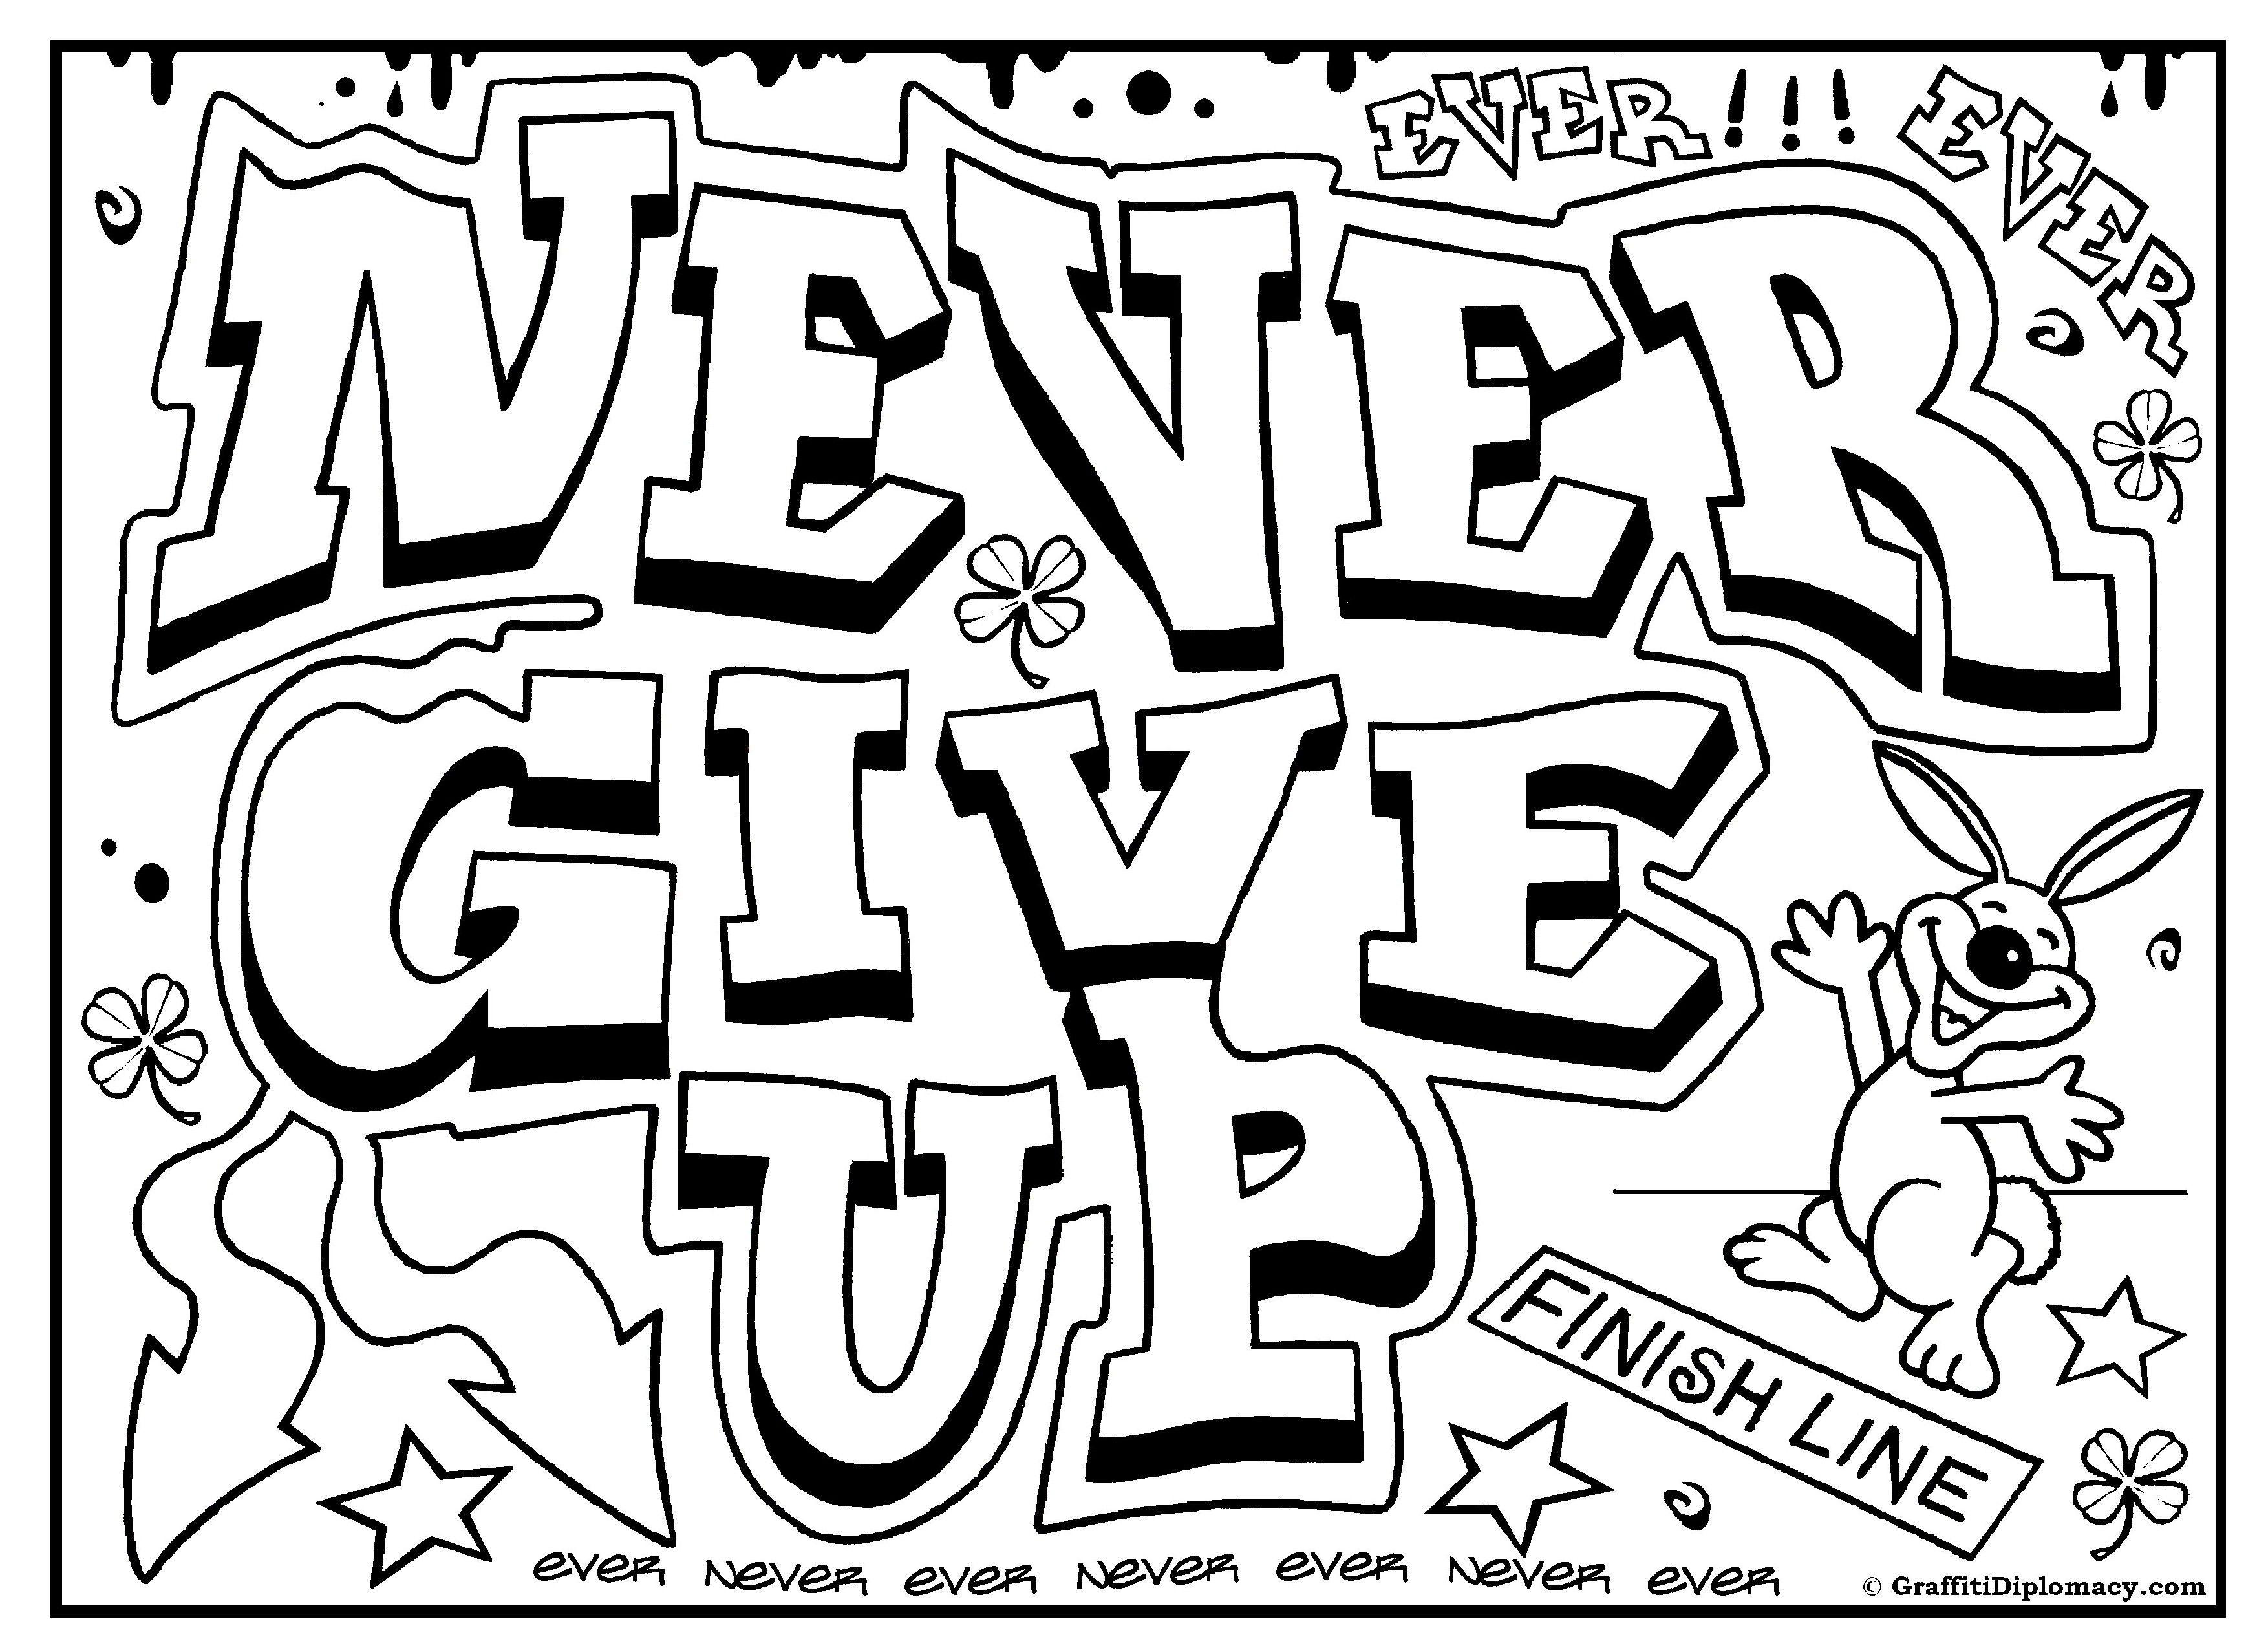 Never Give Up Graffiti, Free Printable Colouring Sheet | Free - Free Printable Coloring Pages On Respect